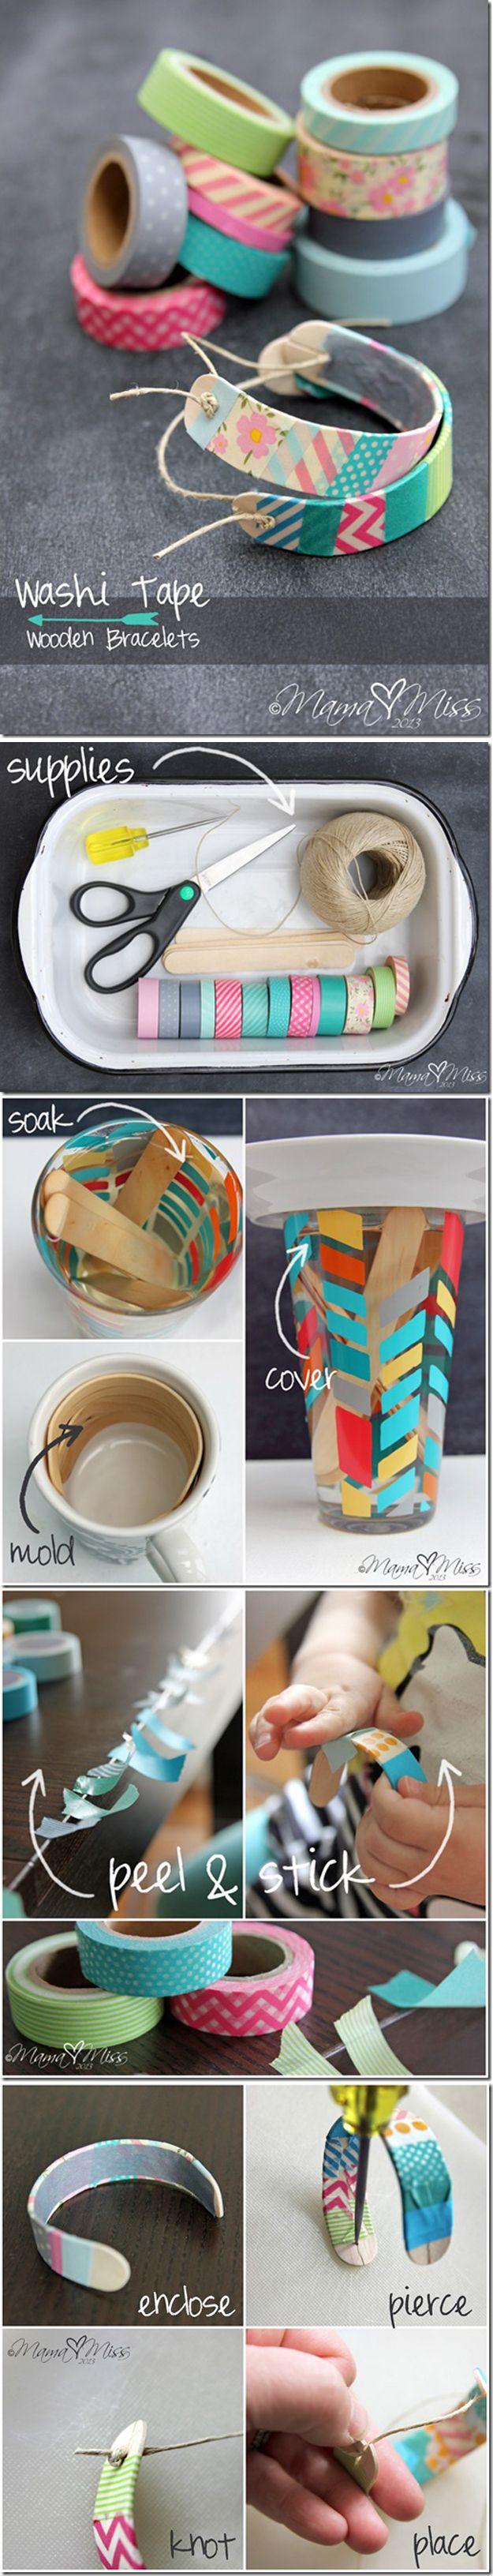 DIY Washi Tape Jewelry   Washi Tape Wooden Bracelets by DIY Ready at http://diyready.com/100-creative-ways-to-use-washi-tape/